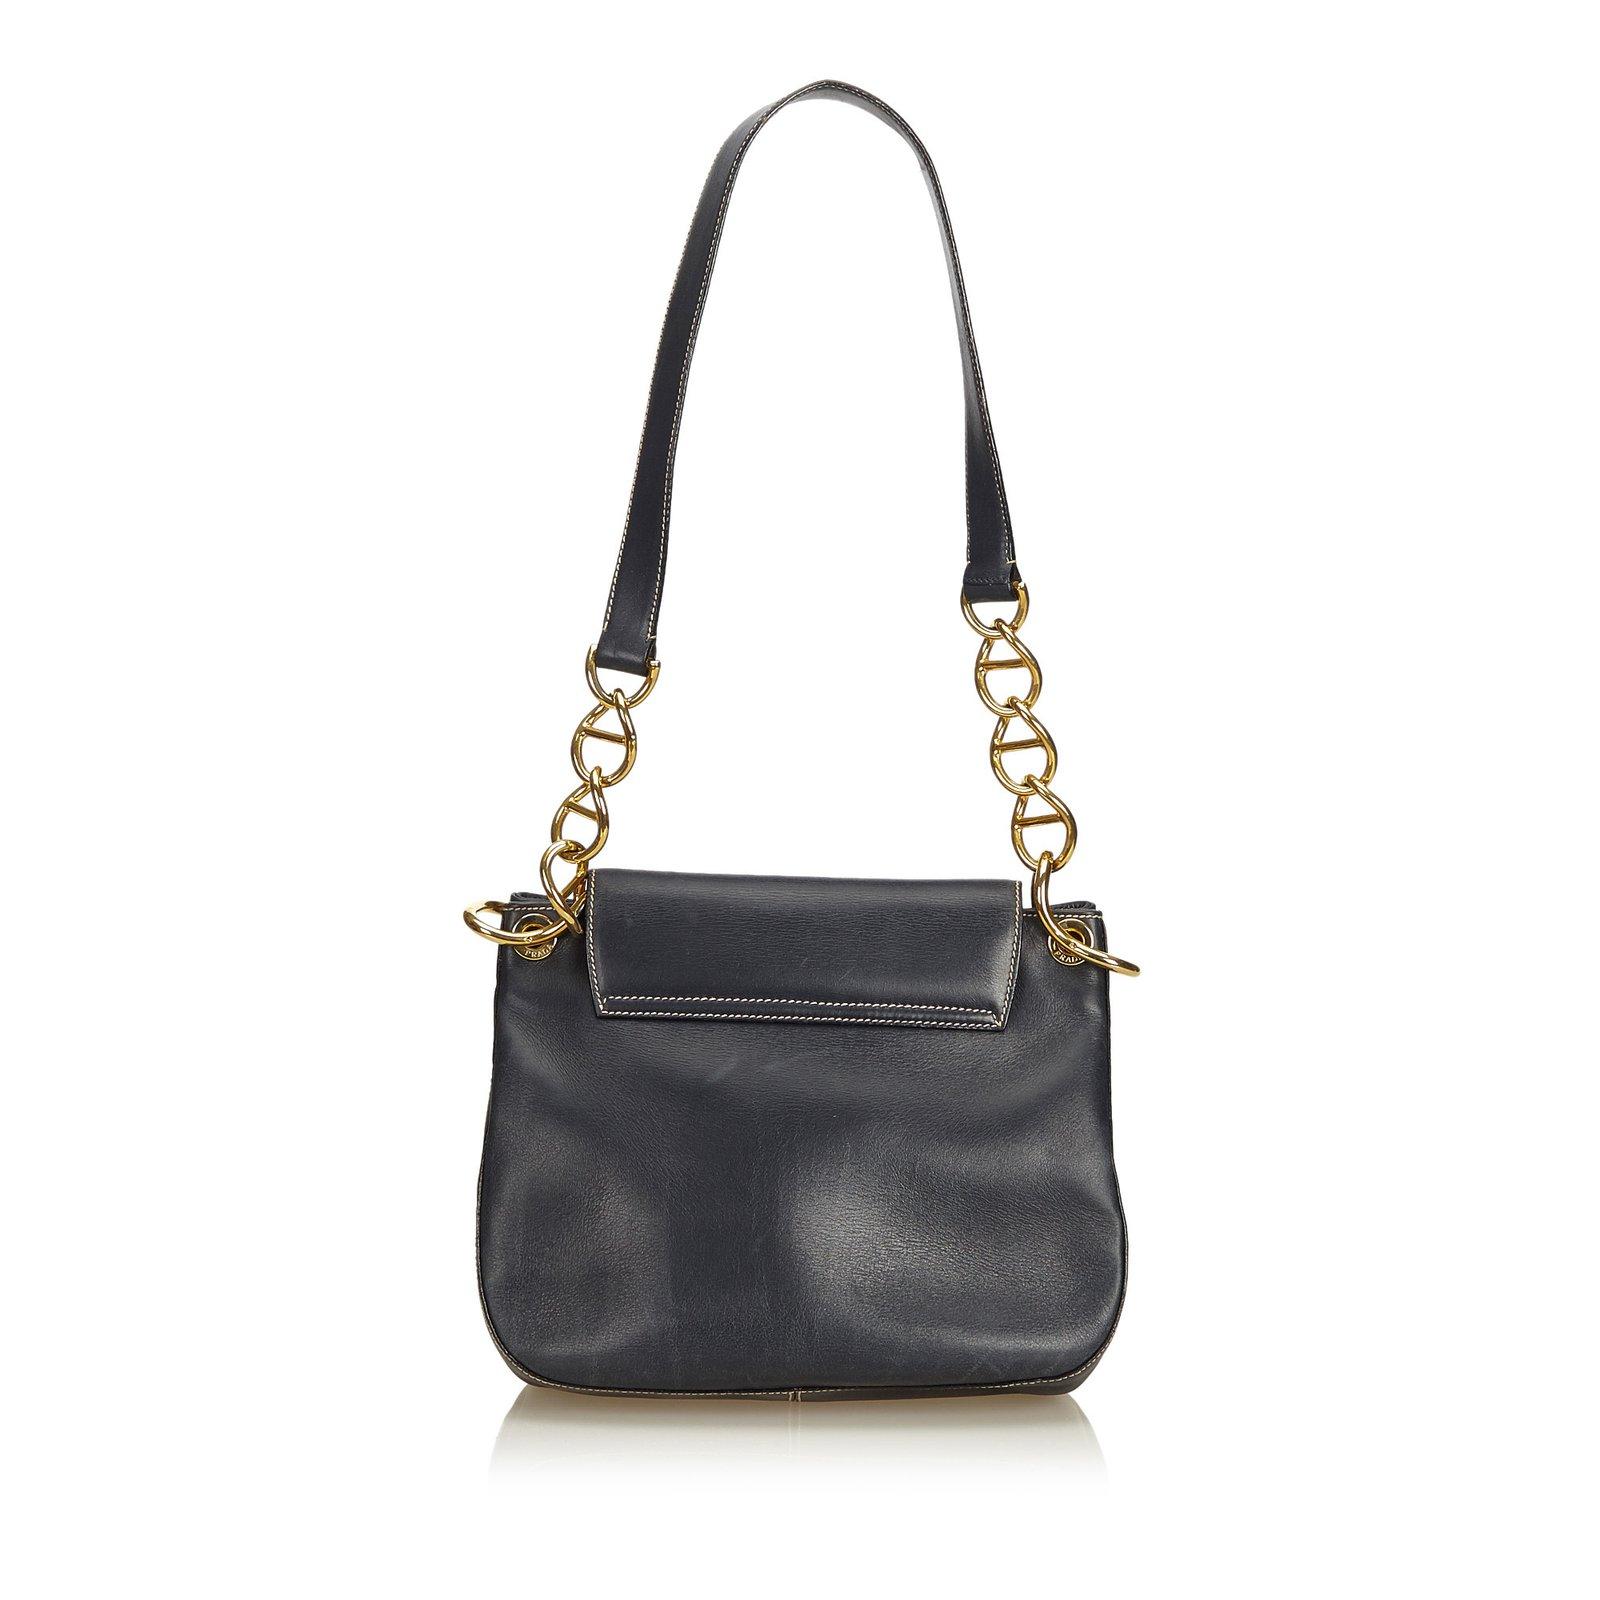 f9d1e4d920ff Prada Calf Leather Chain Shoulder Bag Handbags Leather,Silver,Metal ...